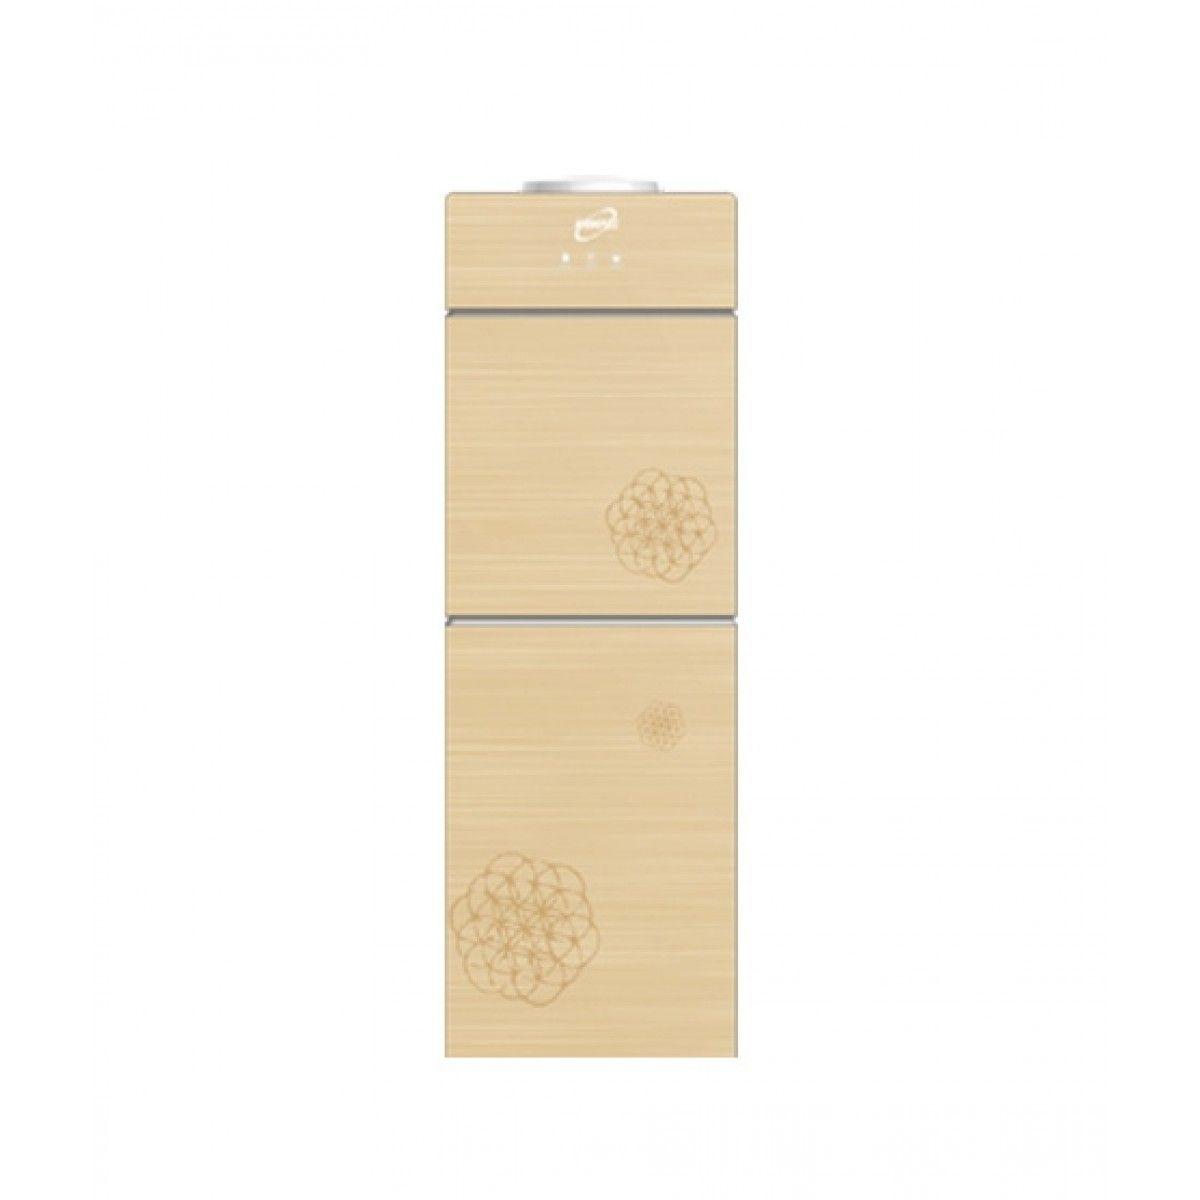 Homage 2 Taps HWD-65 Water Dispenser